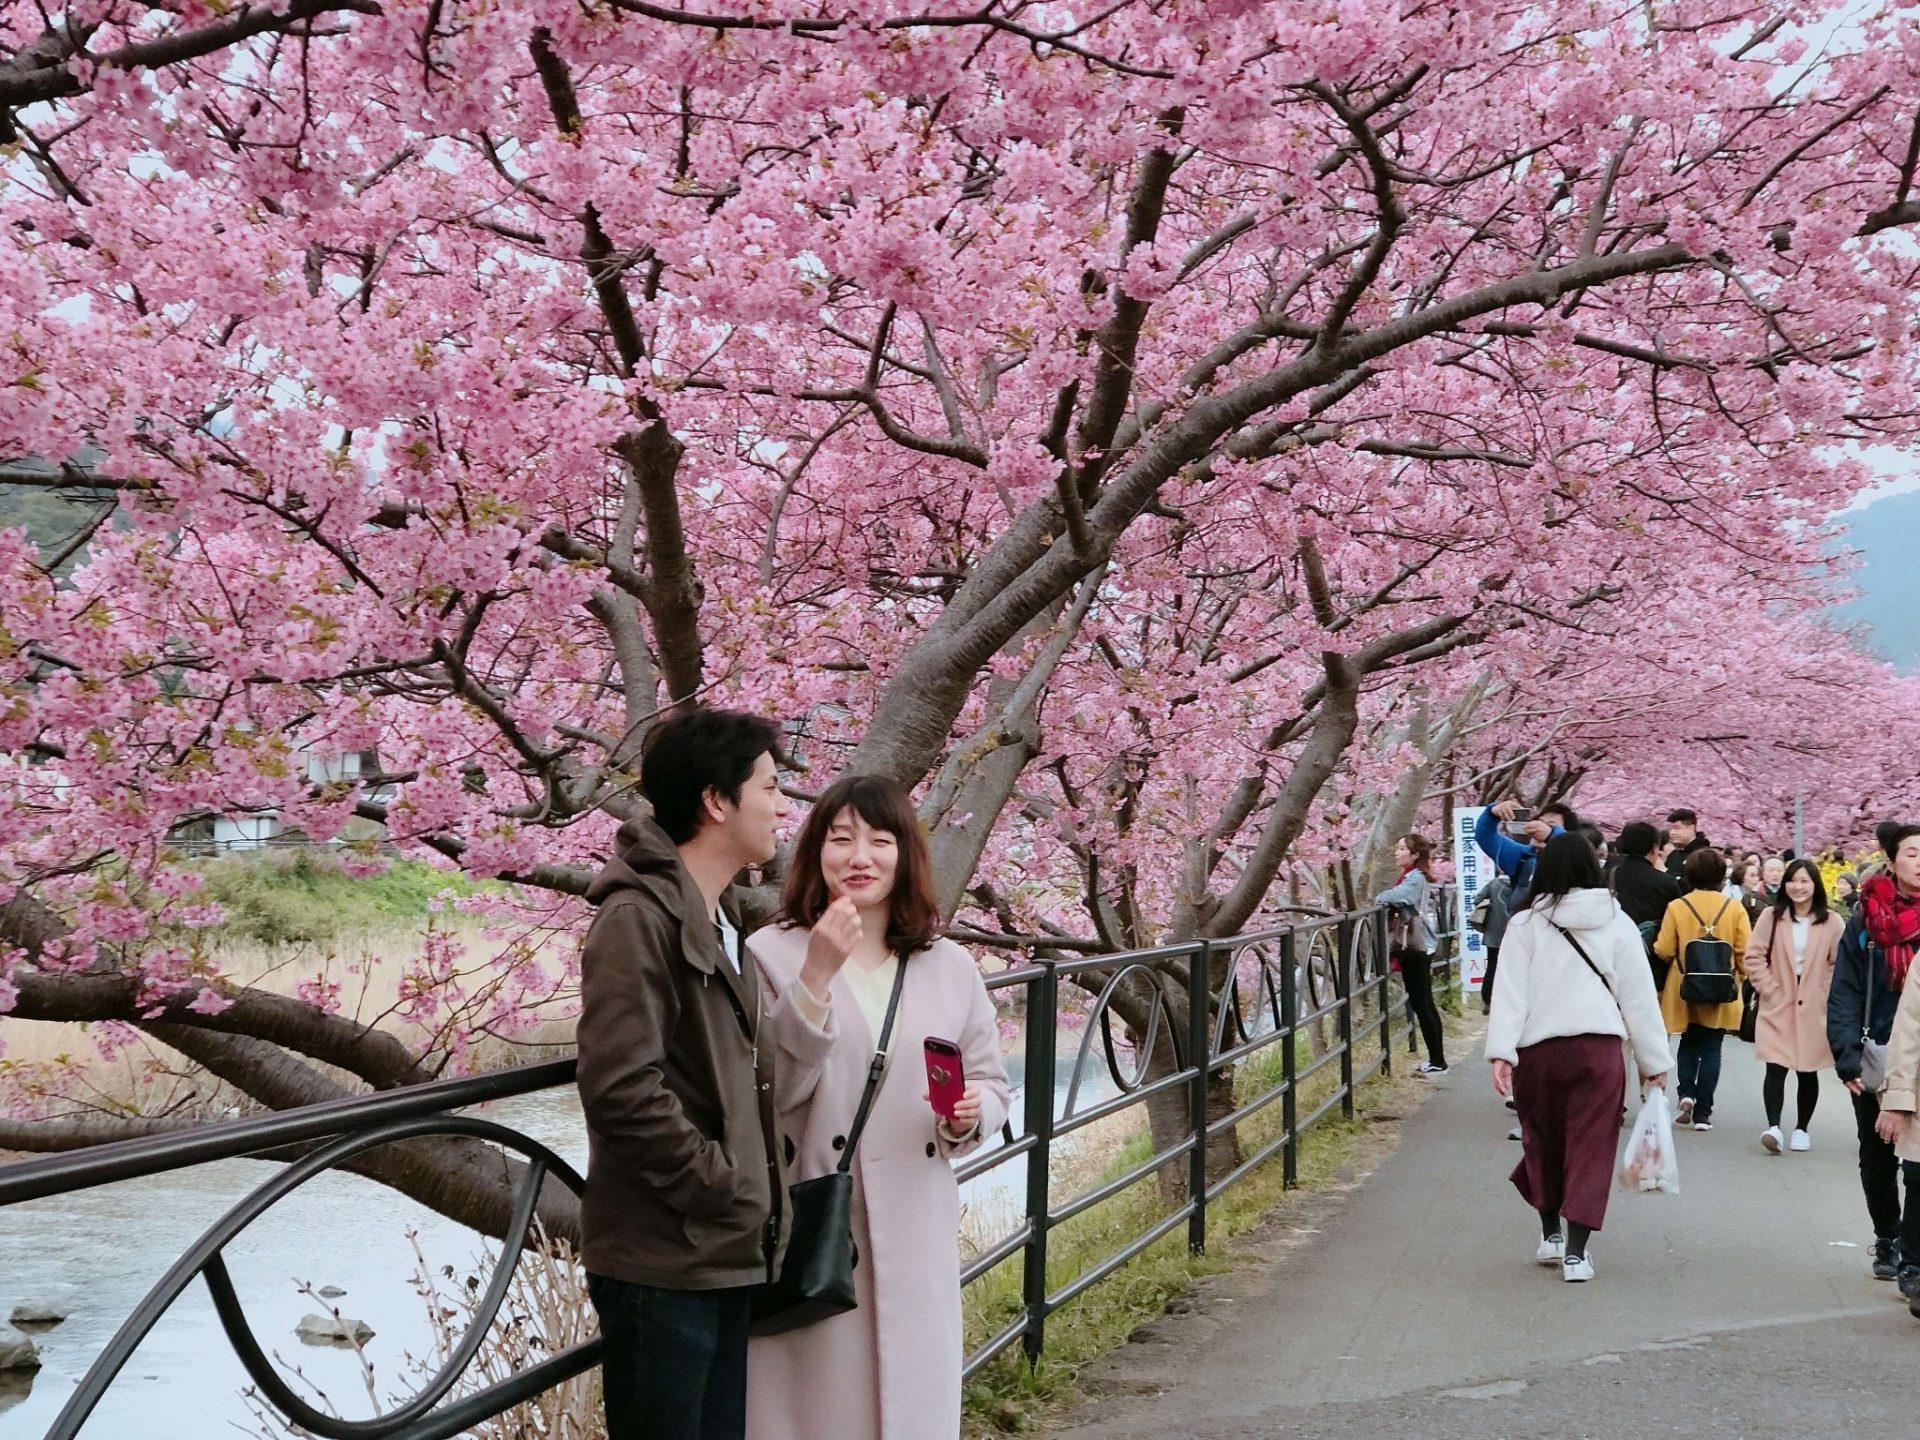 cherry blossoms galore; Couple celebrating sakura festival